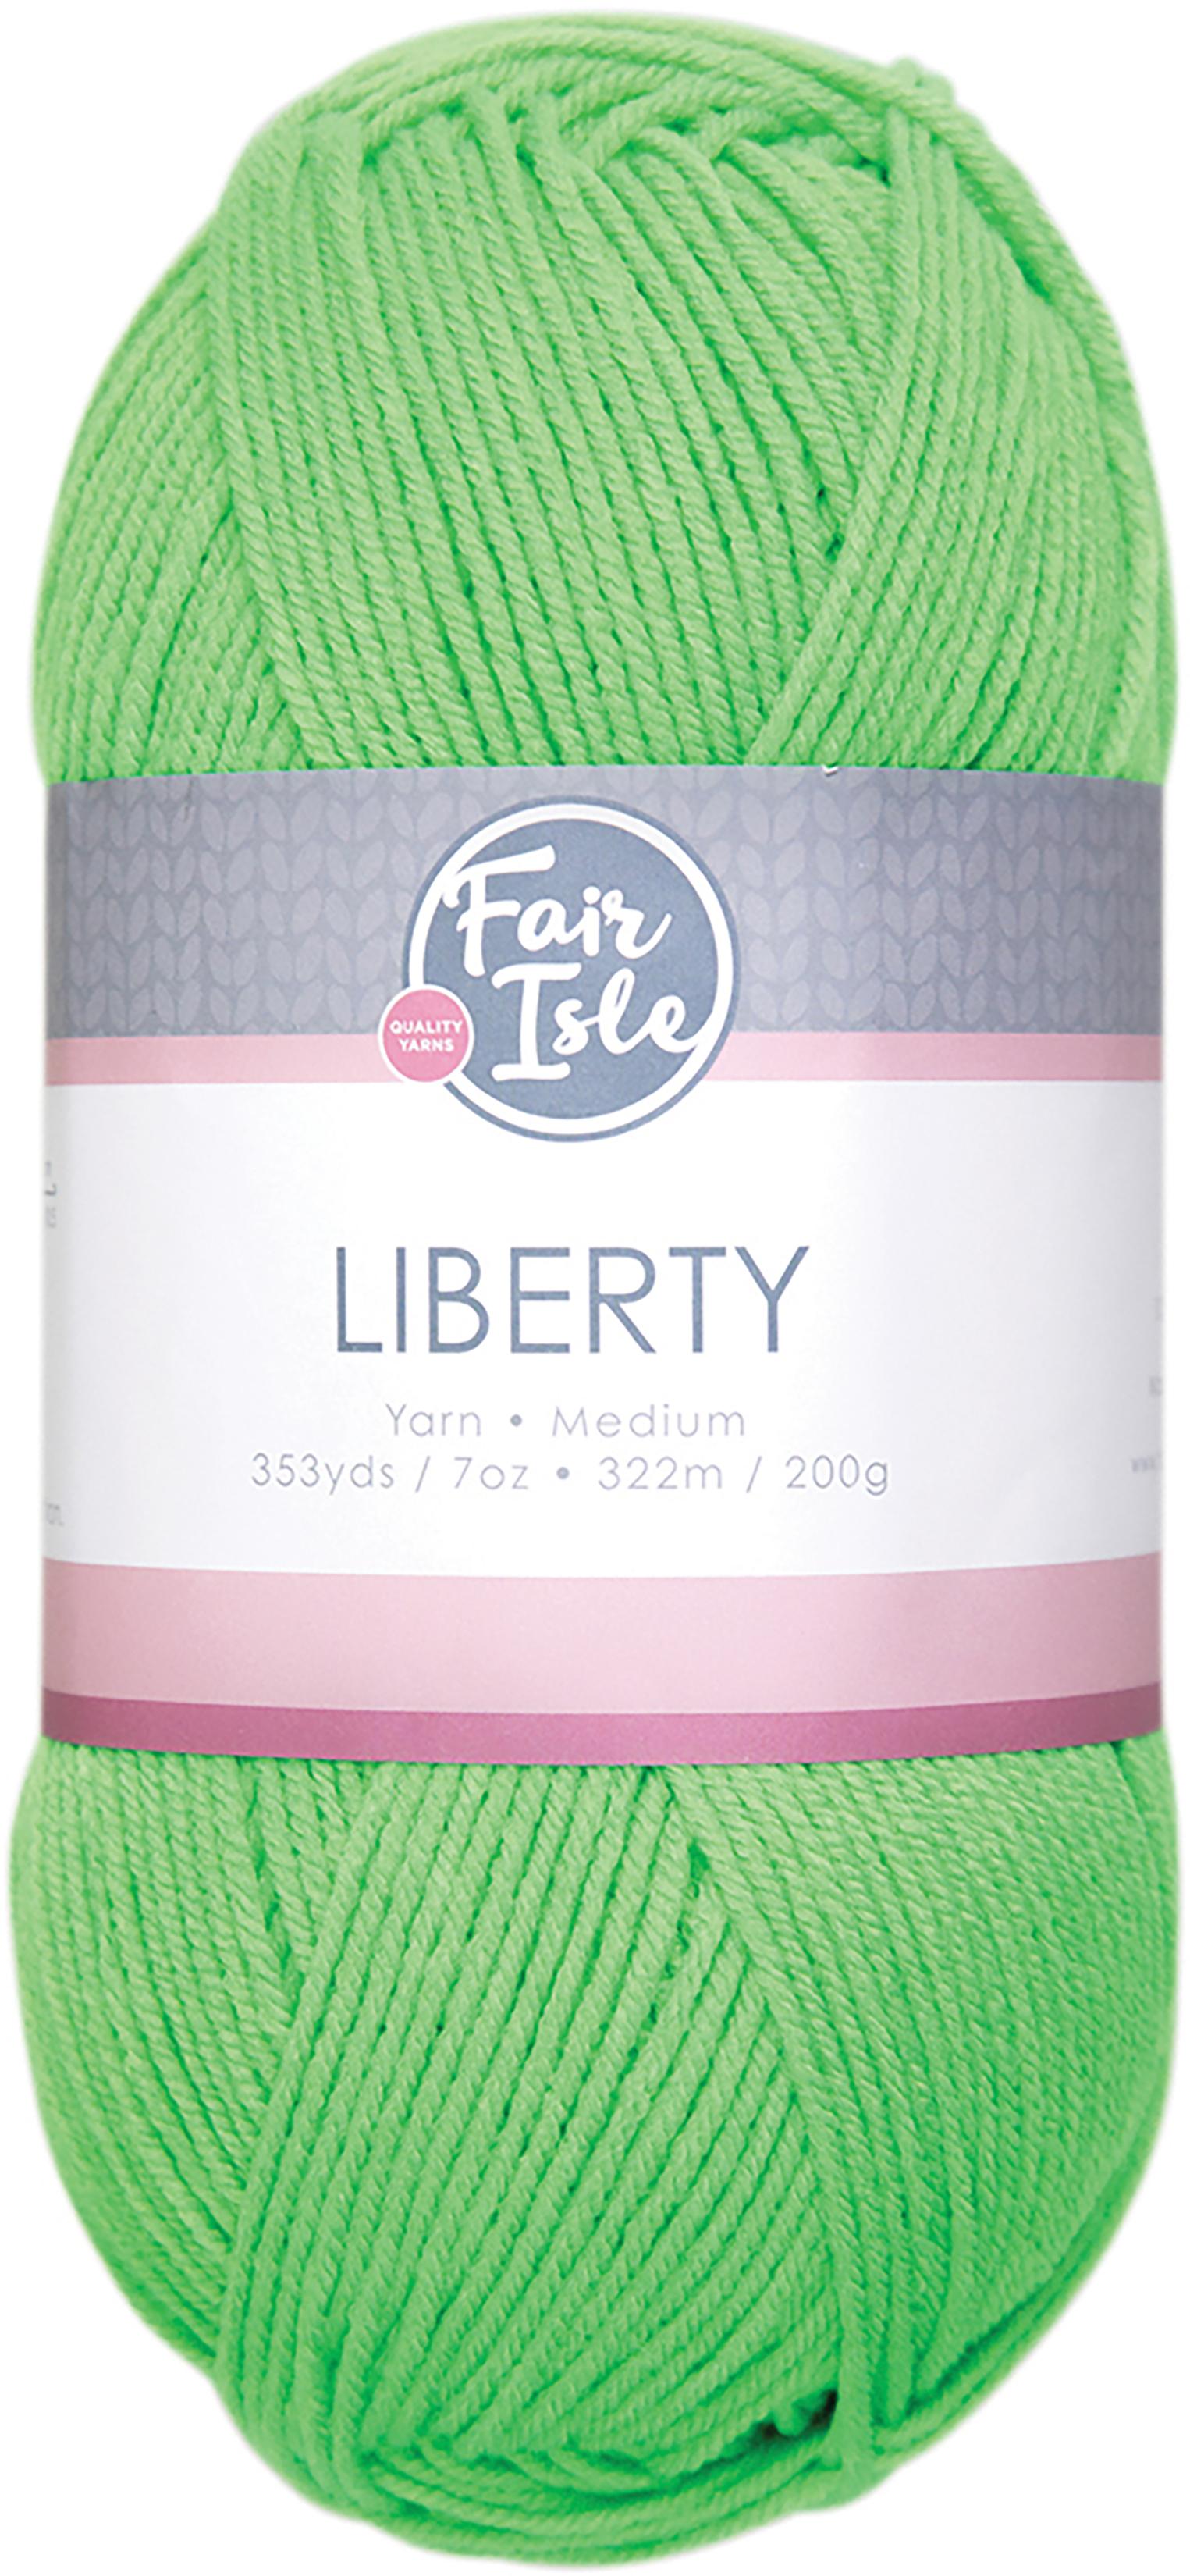 Fair Isle Liberty 200g Yarn-Limerick Pop